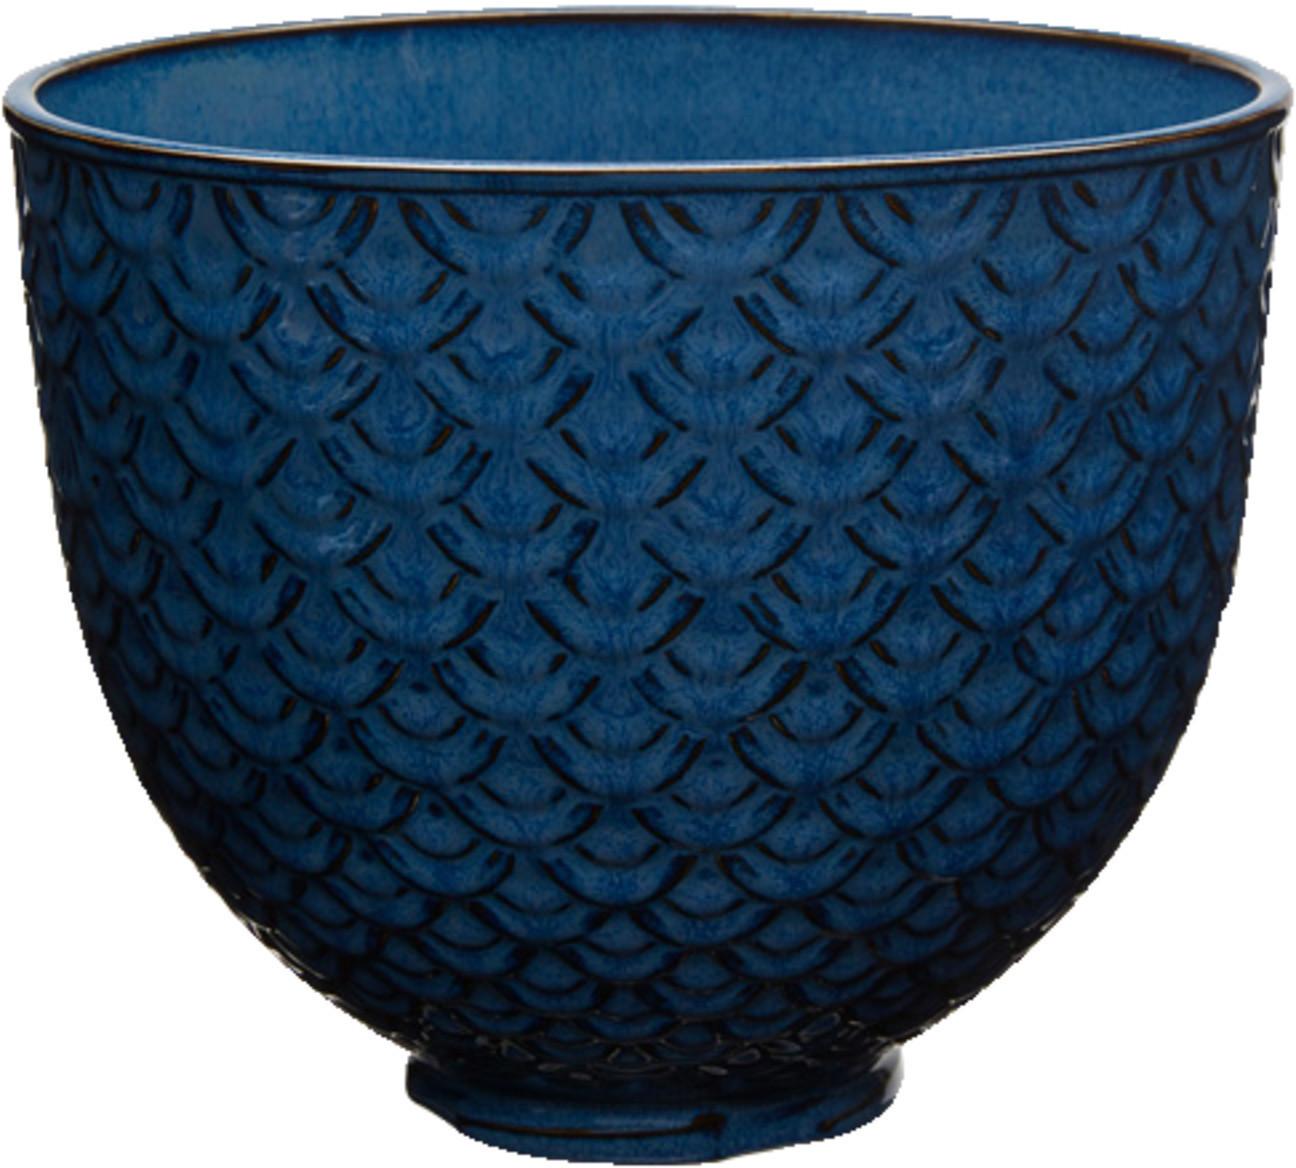 KitchenAid Keramikschüssel Mermaid Lace (5KSM2CB5TML)